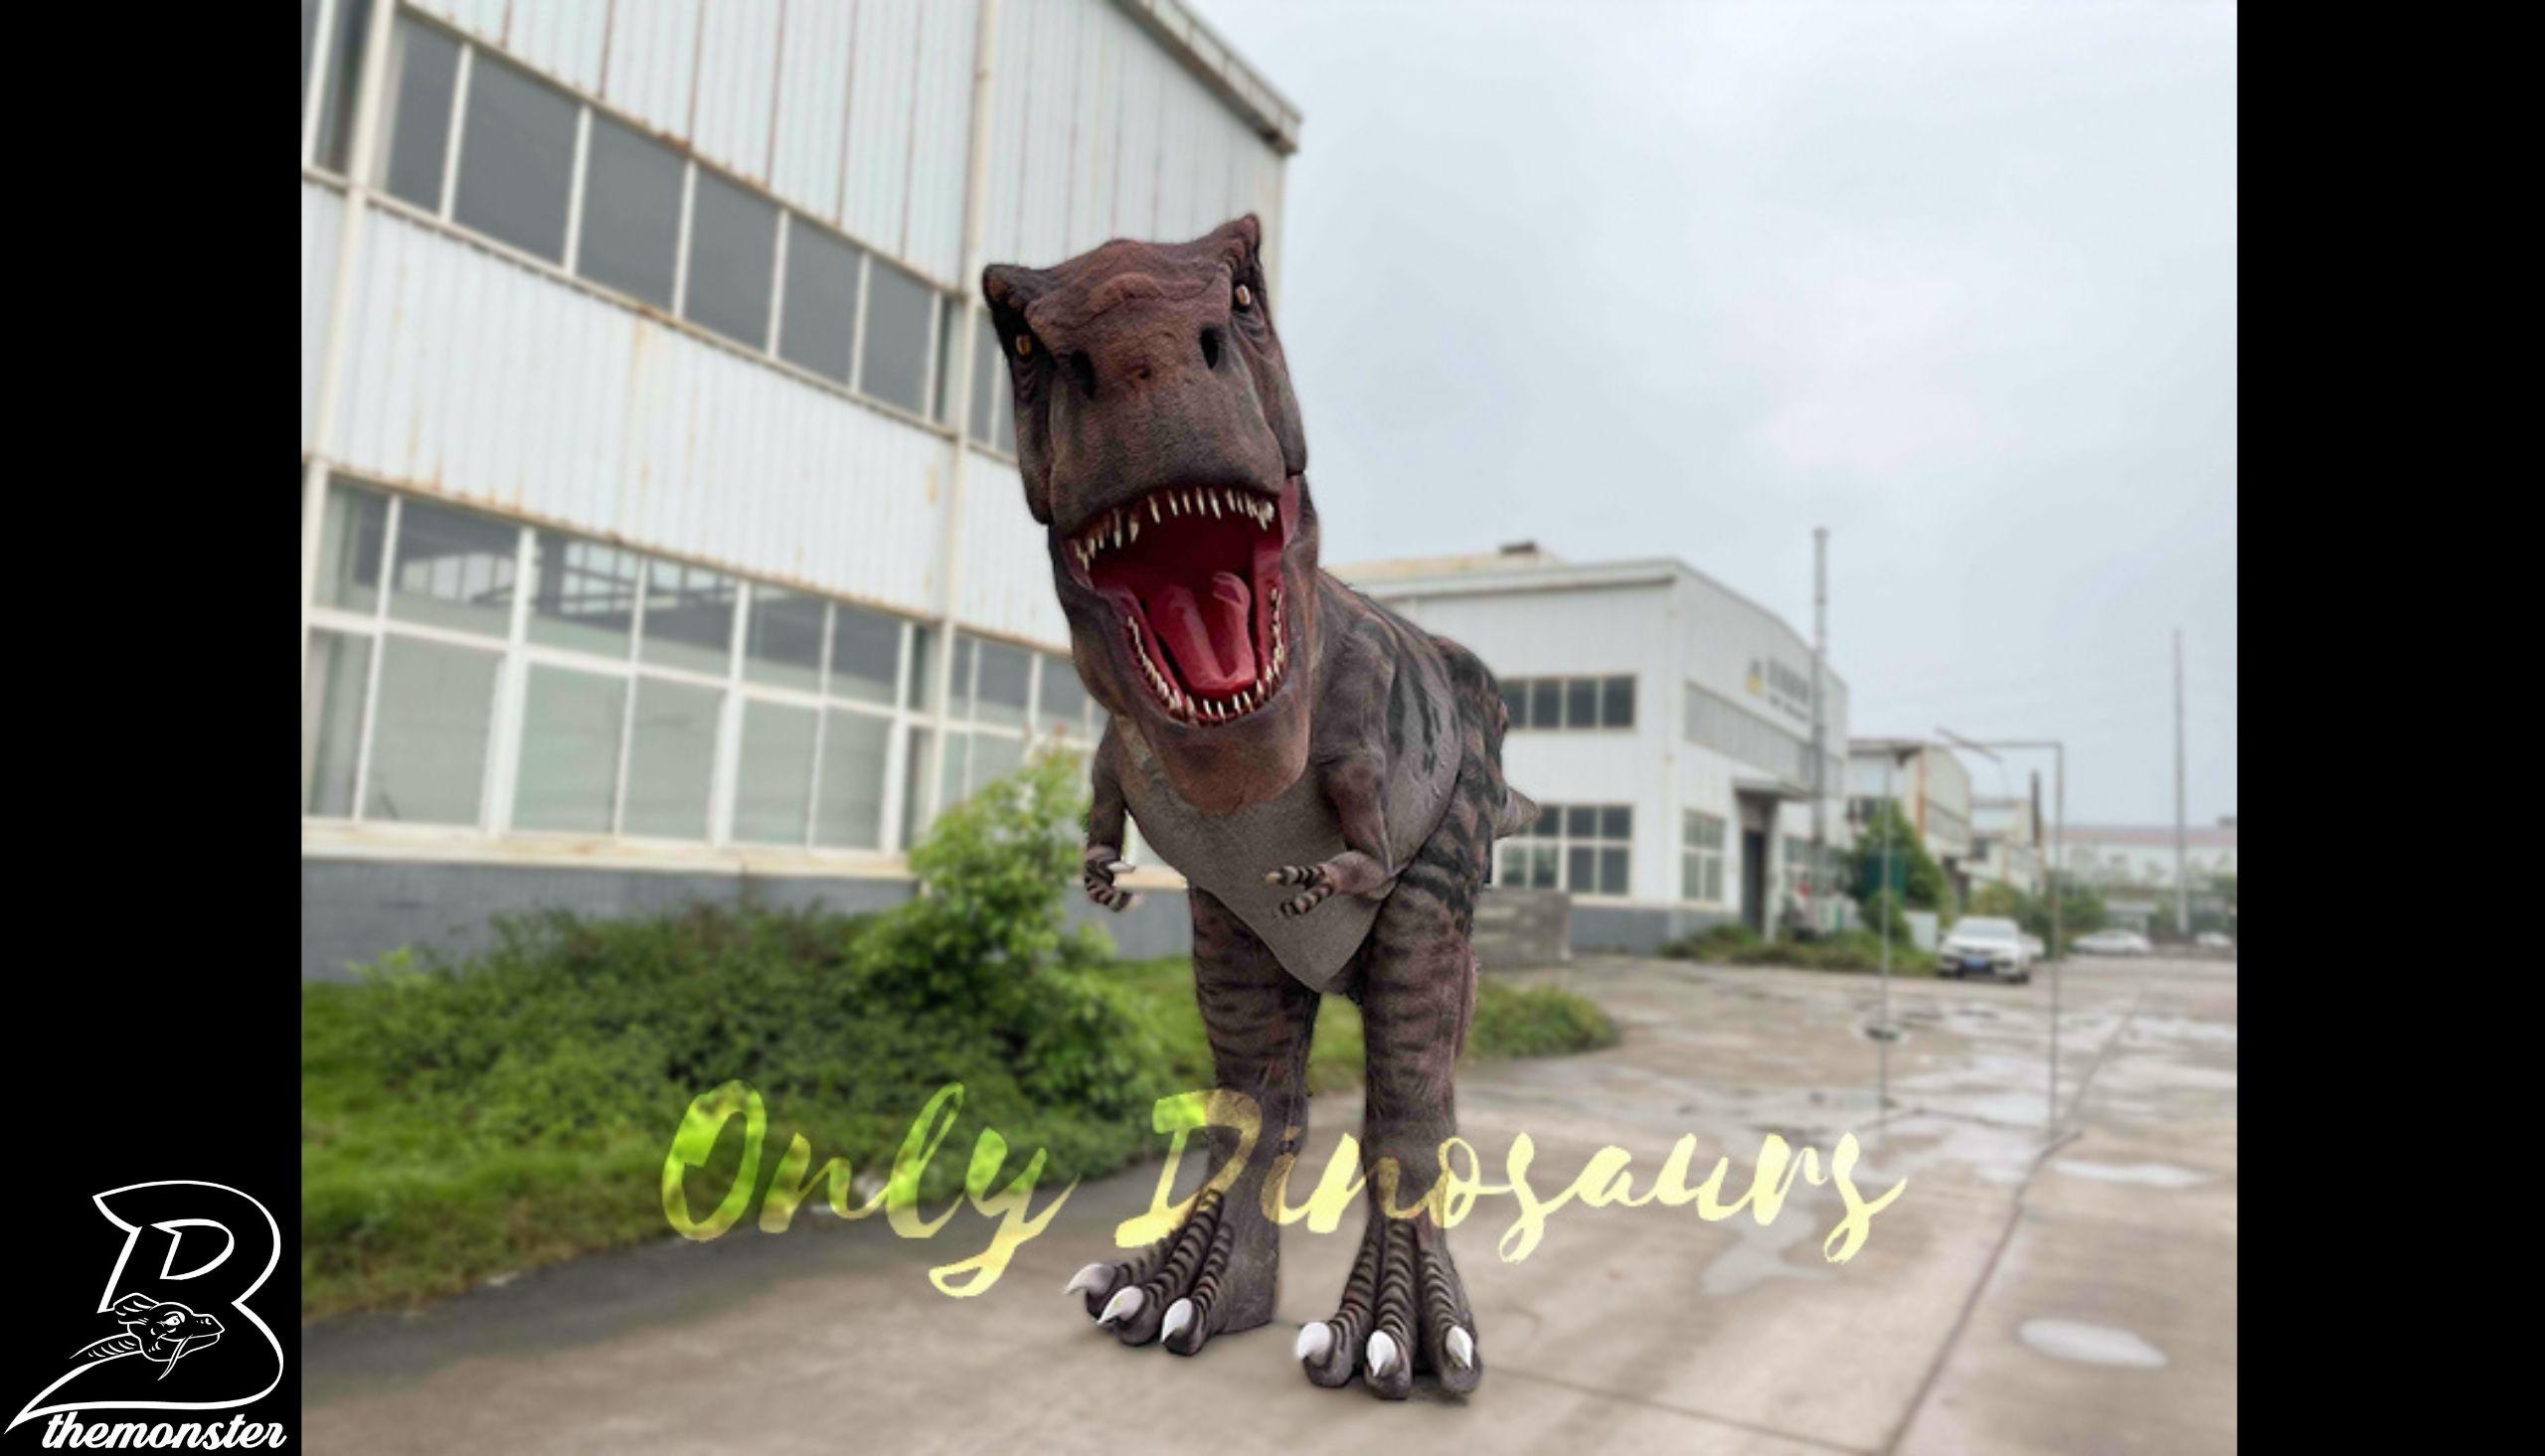 Lifesize Tyrannosaurus Rex Stilts Dinosaur Costume in vendita sul Bthemonster.com